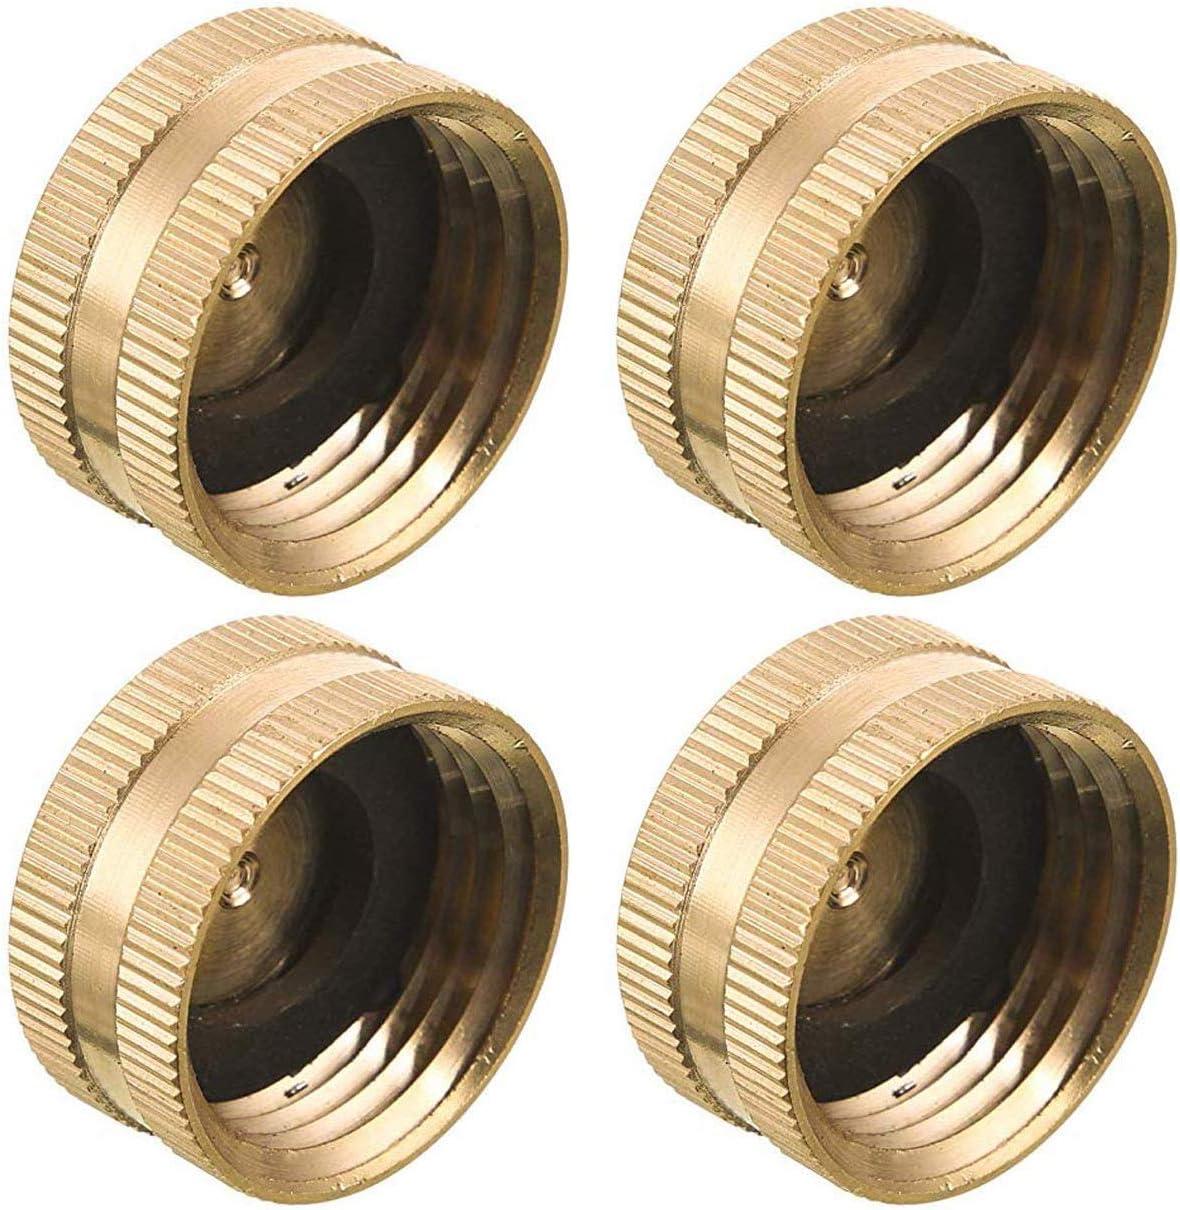 cozyou 4 Pack Brass Hose Cap Garden Hose Female Thread End Cap Connector